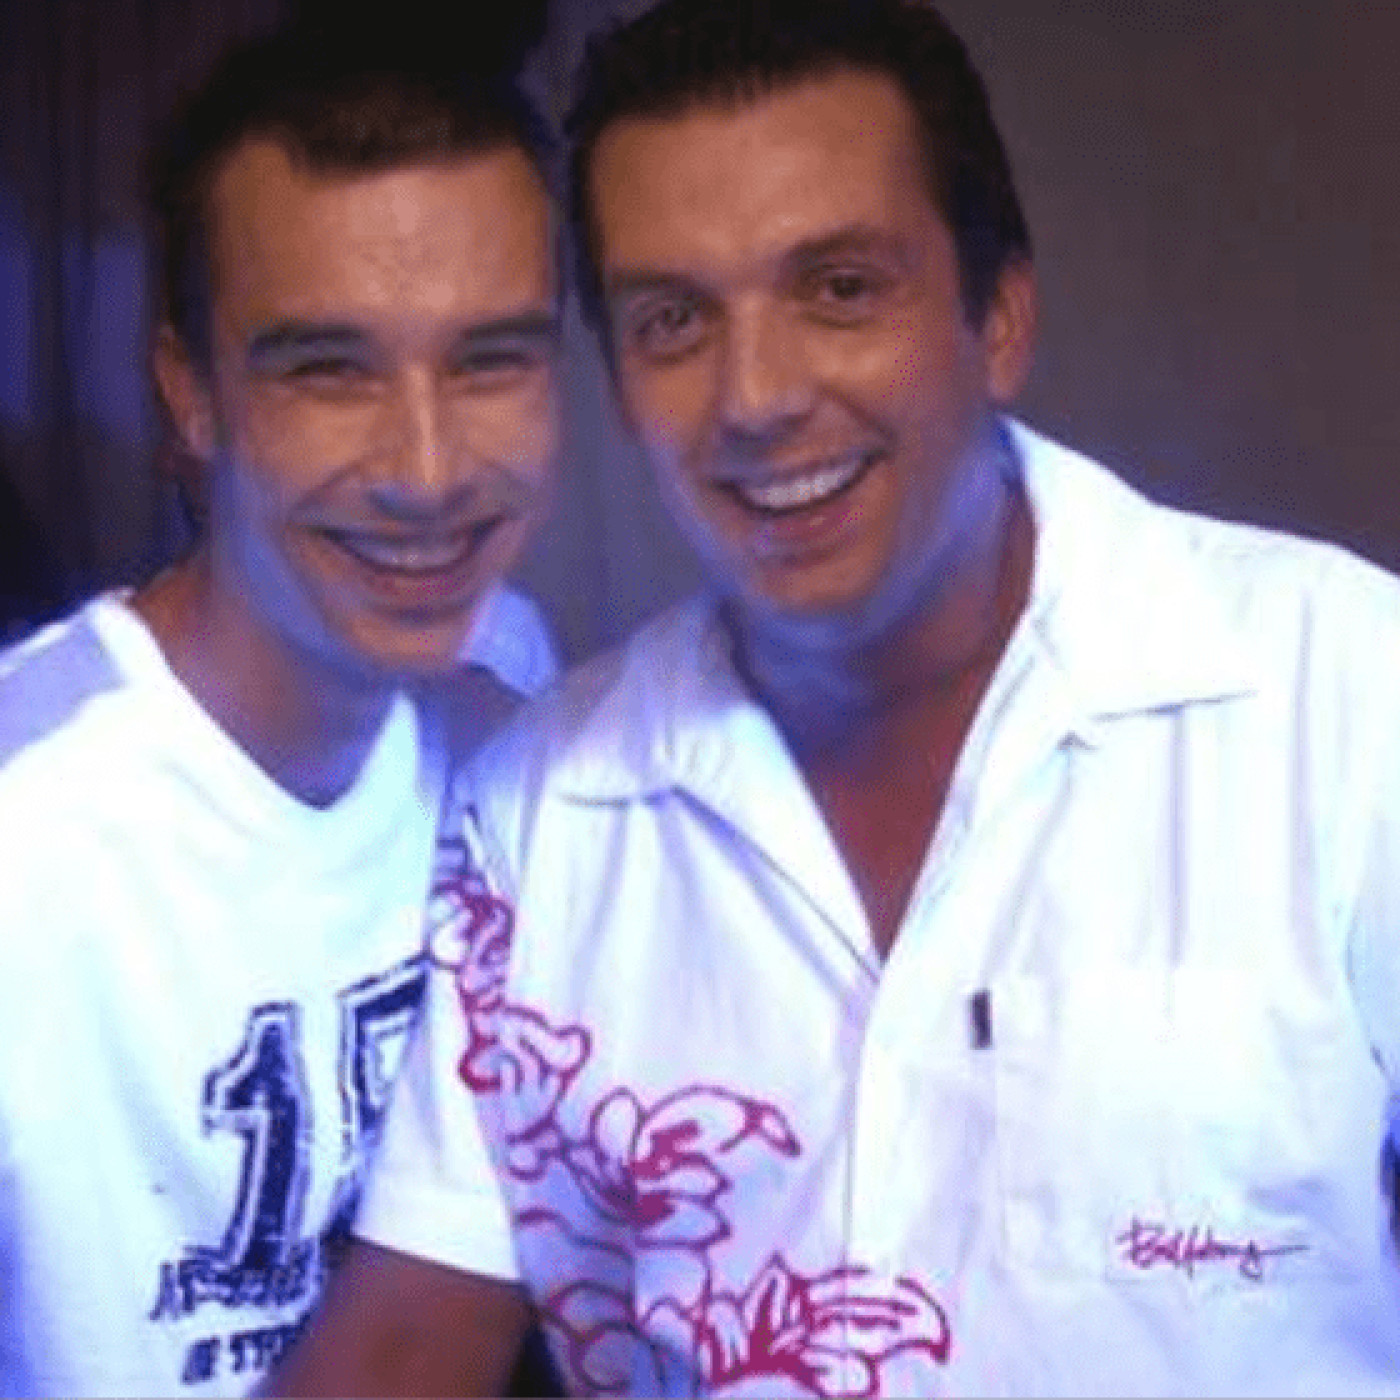 Retour en 2005 avec Alex, co-fondateur de la radio - 06 01 2021 - StereoChic Radio